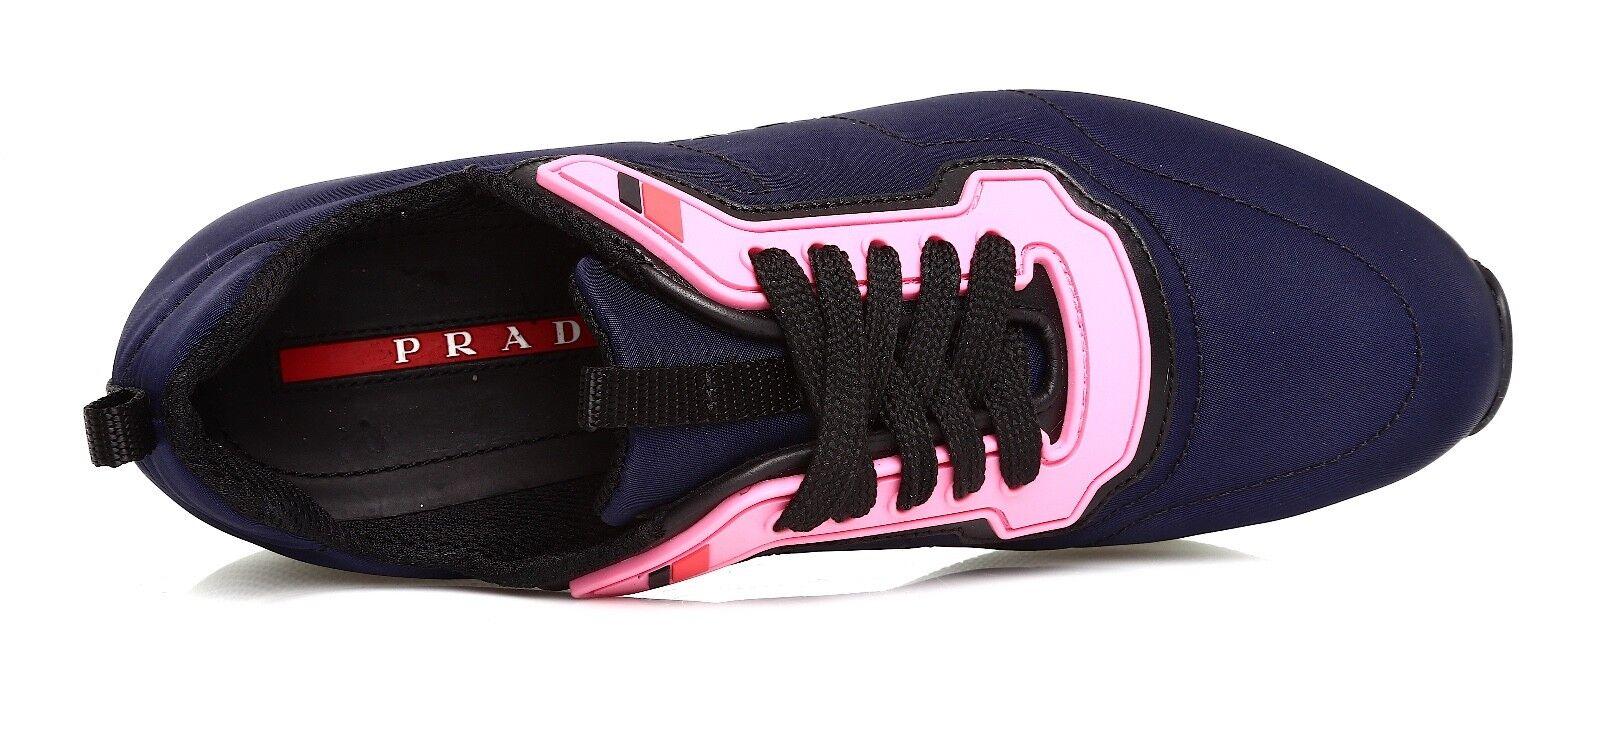 Prada Linea Rossa Rossa Rossa Women's  Running Navy bluee Sneakers Sz 40 EUR 4544 7ee8a7